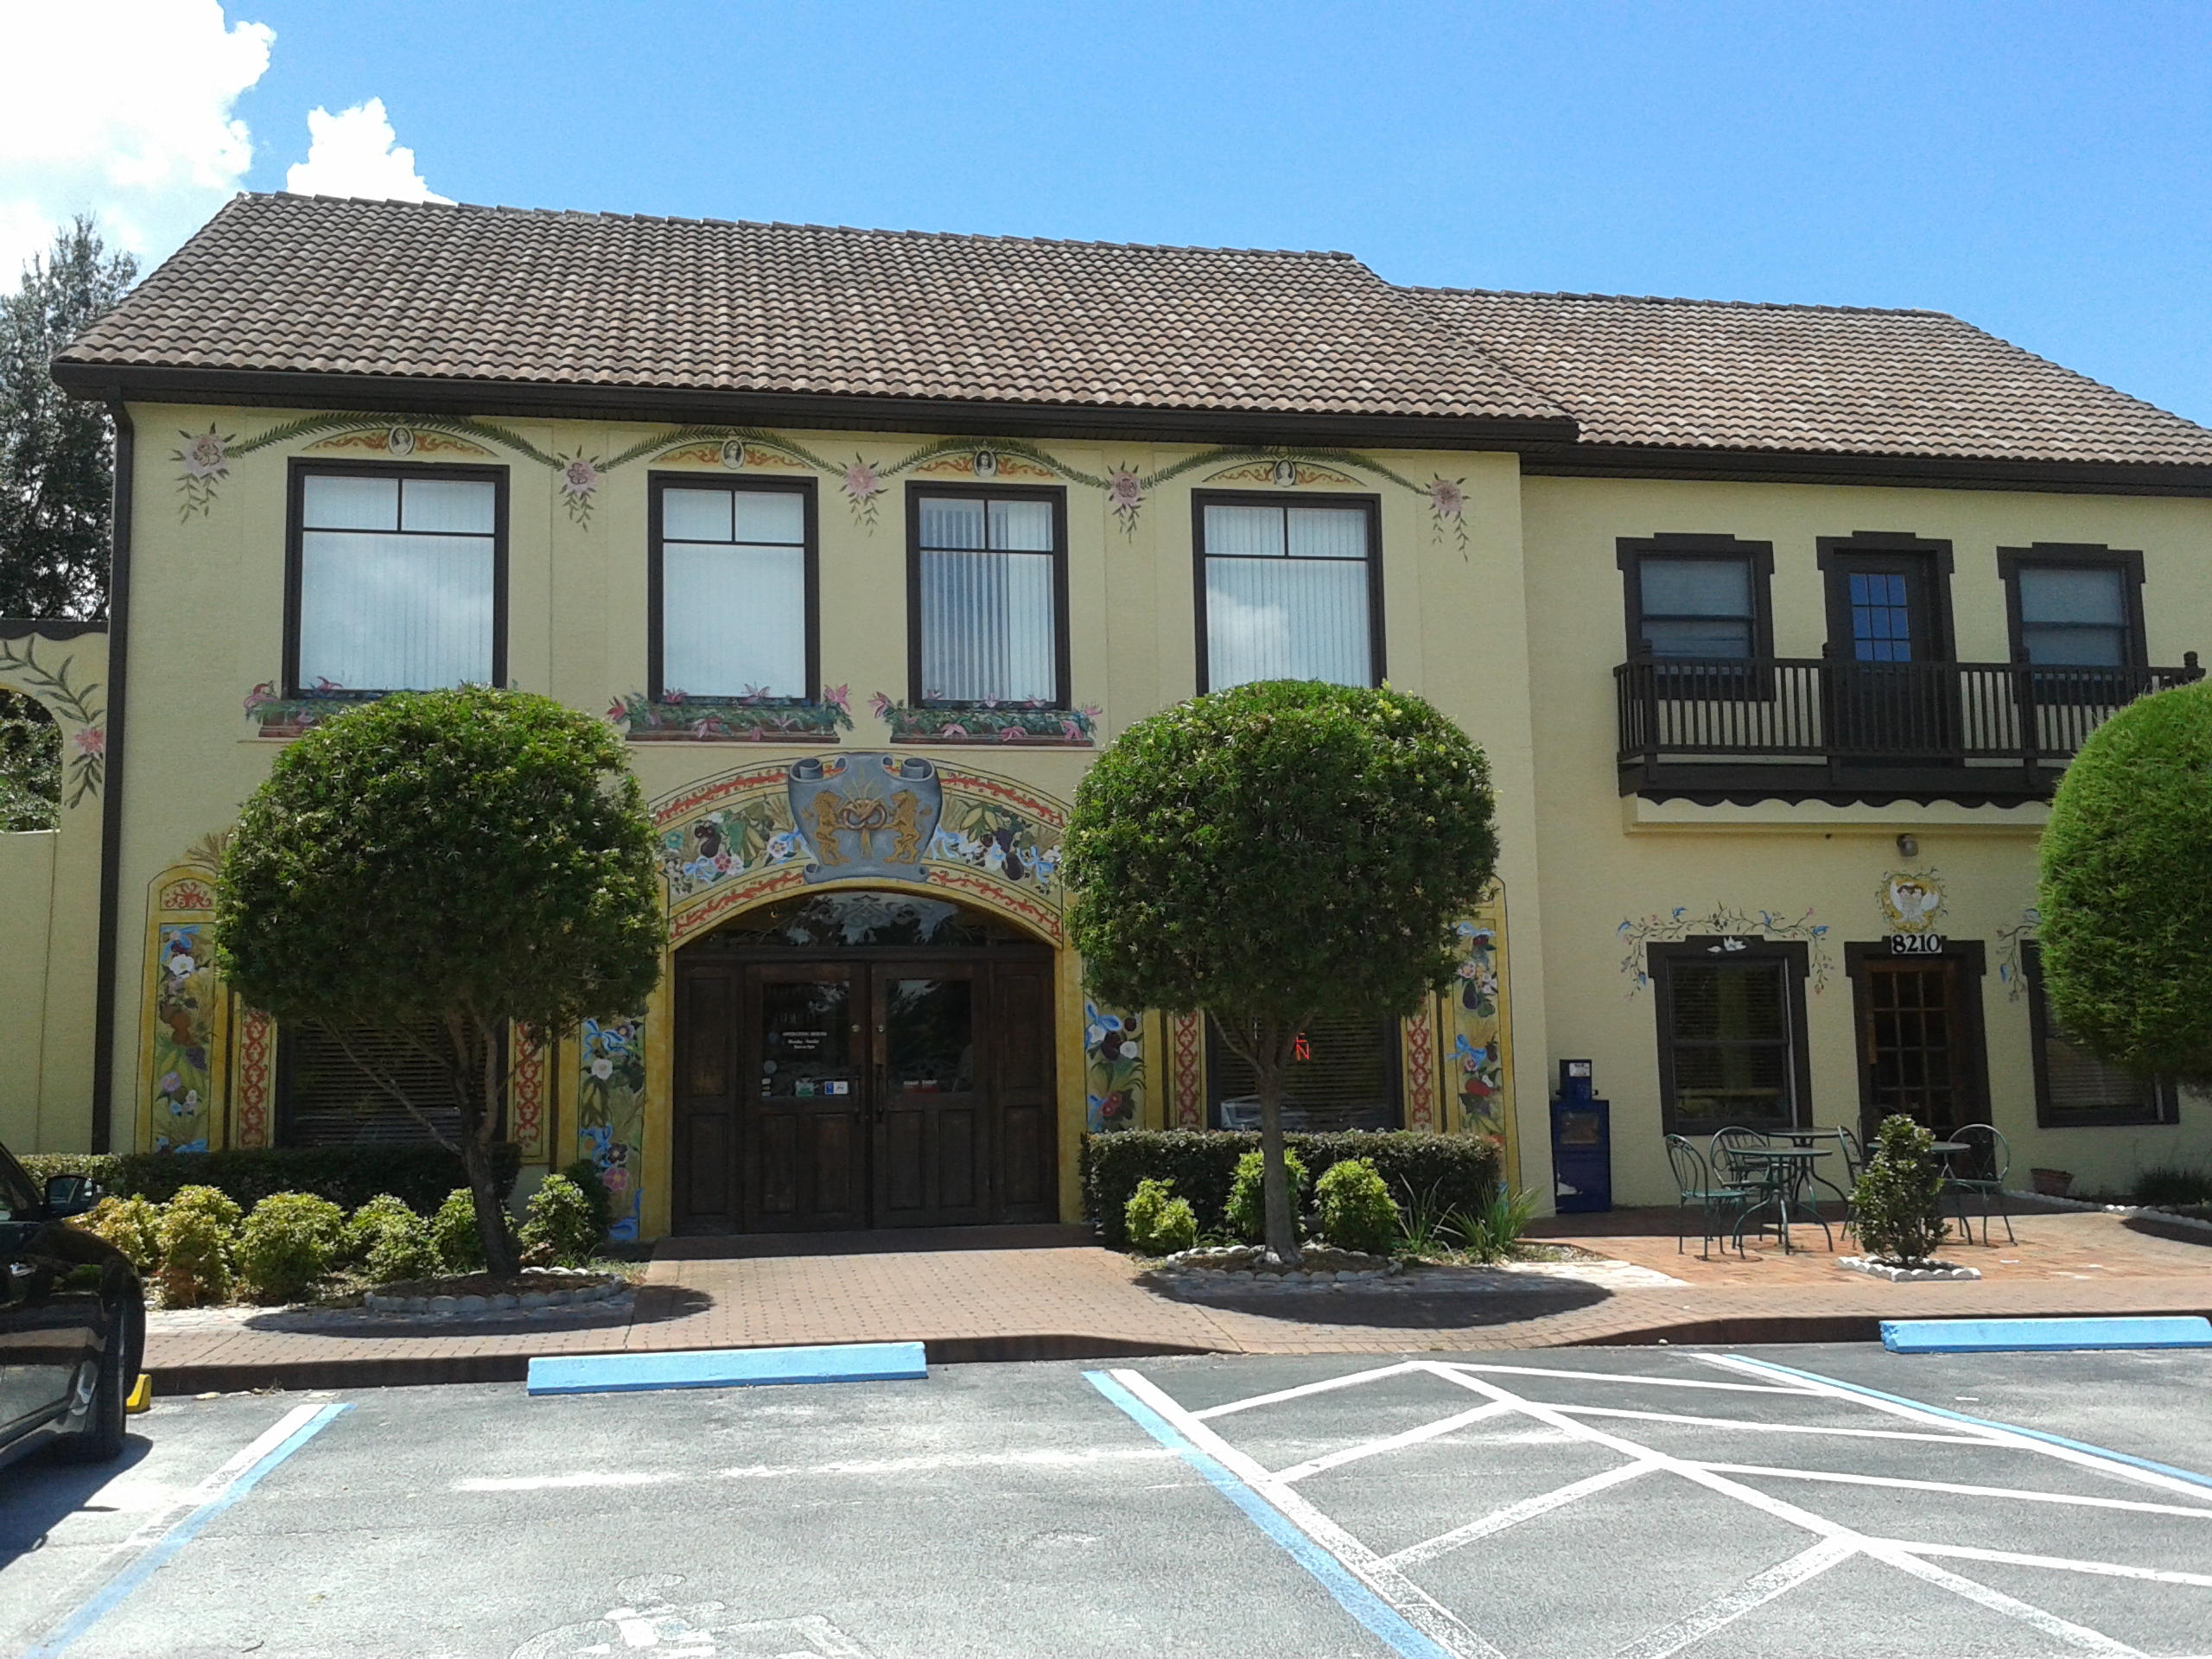 yalaha florida bakery yalaha florida homes for sale